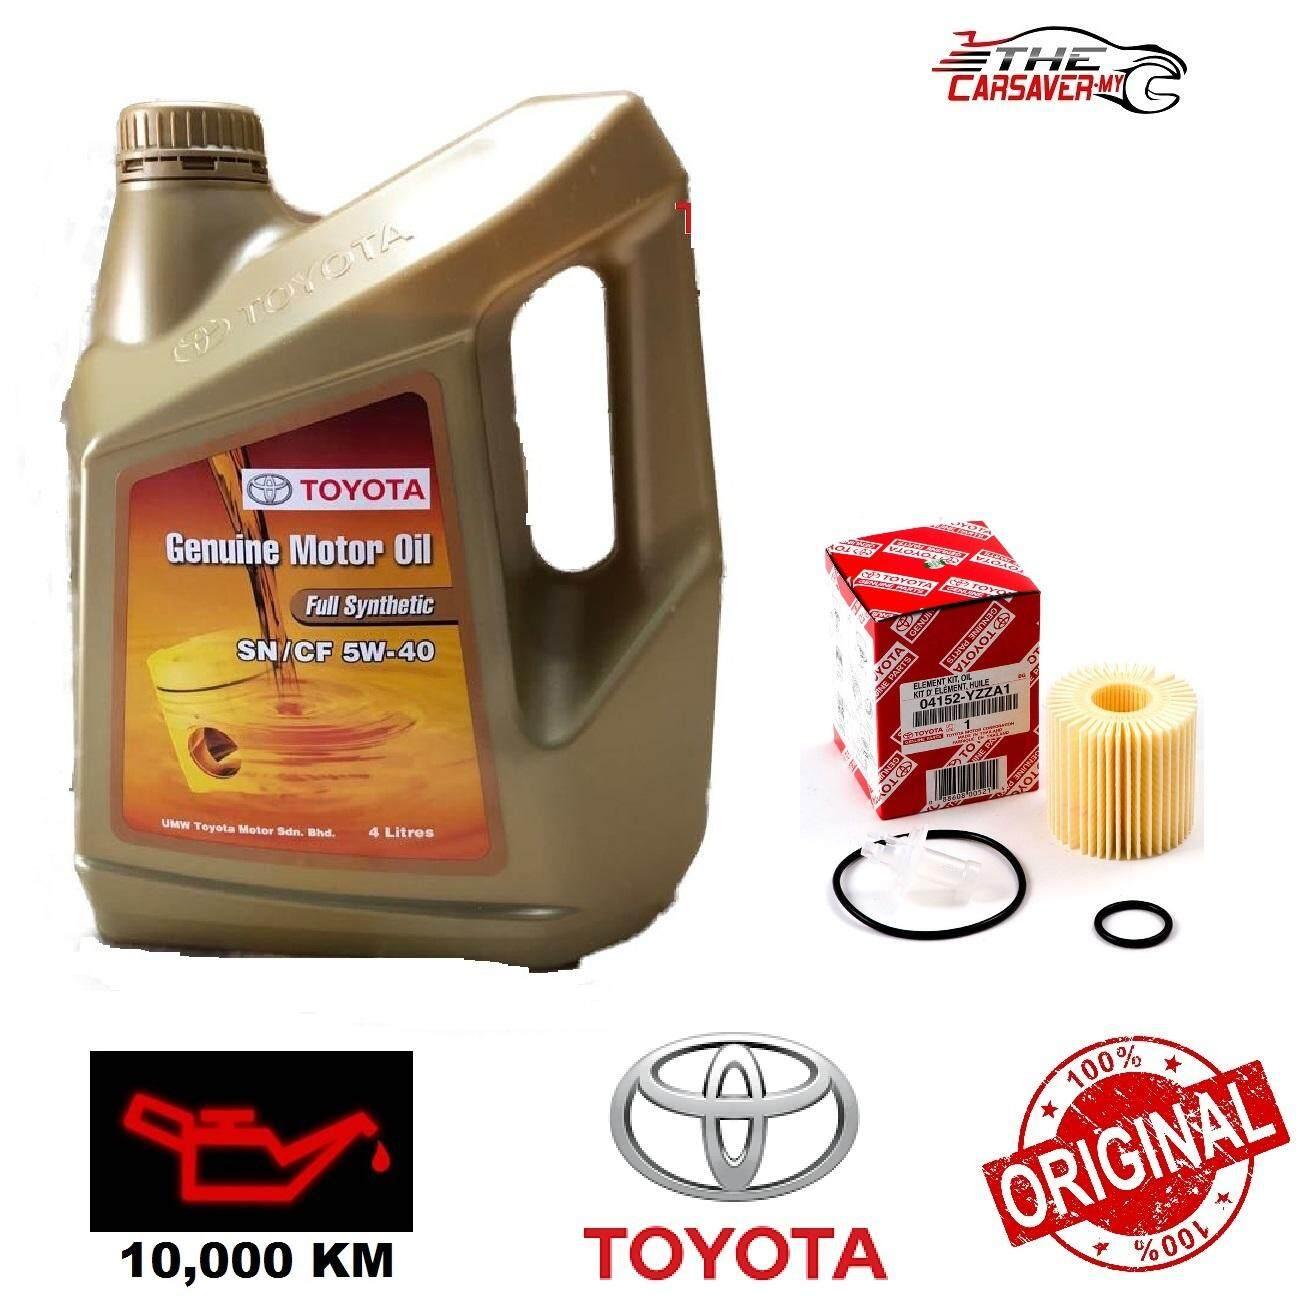 Toyota SN/CF 5W-40 Genuine Motor Oil Full Synthetic- 4L +Toyota Genuine Oil Filter (04152-YZZA1)